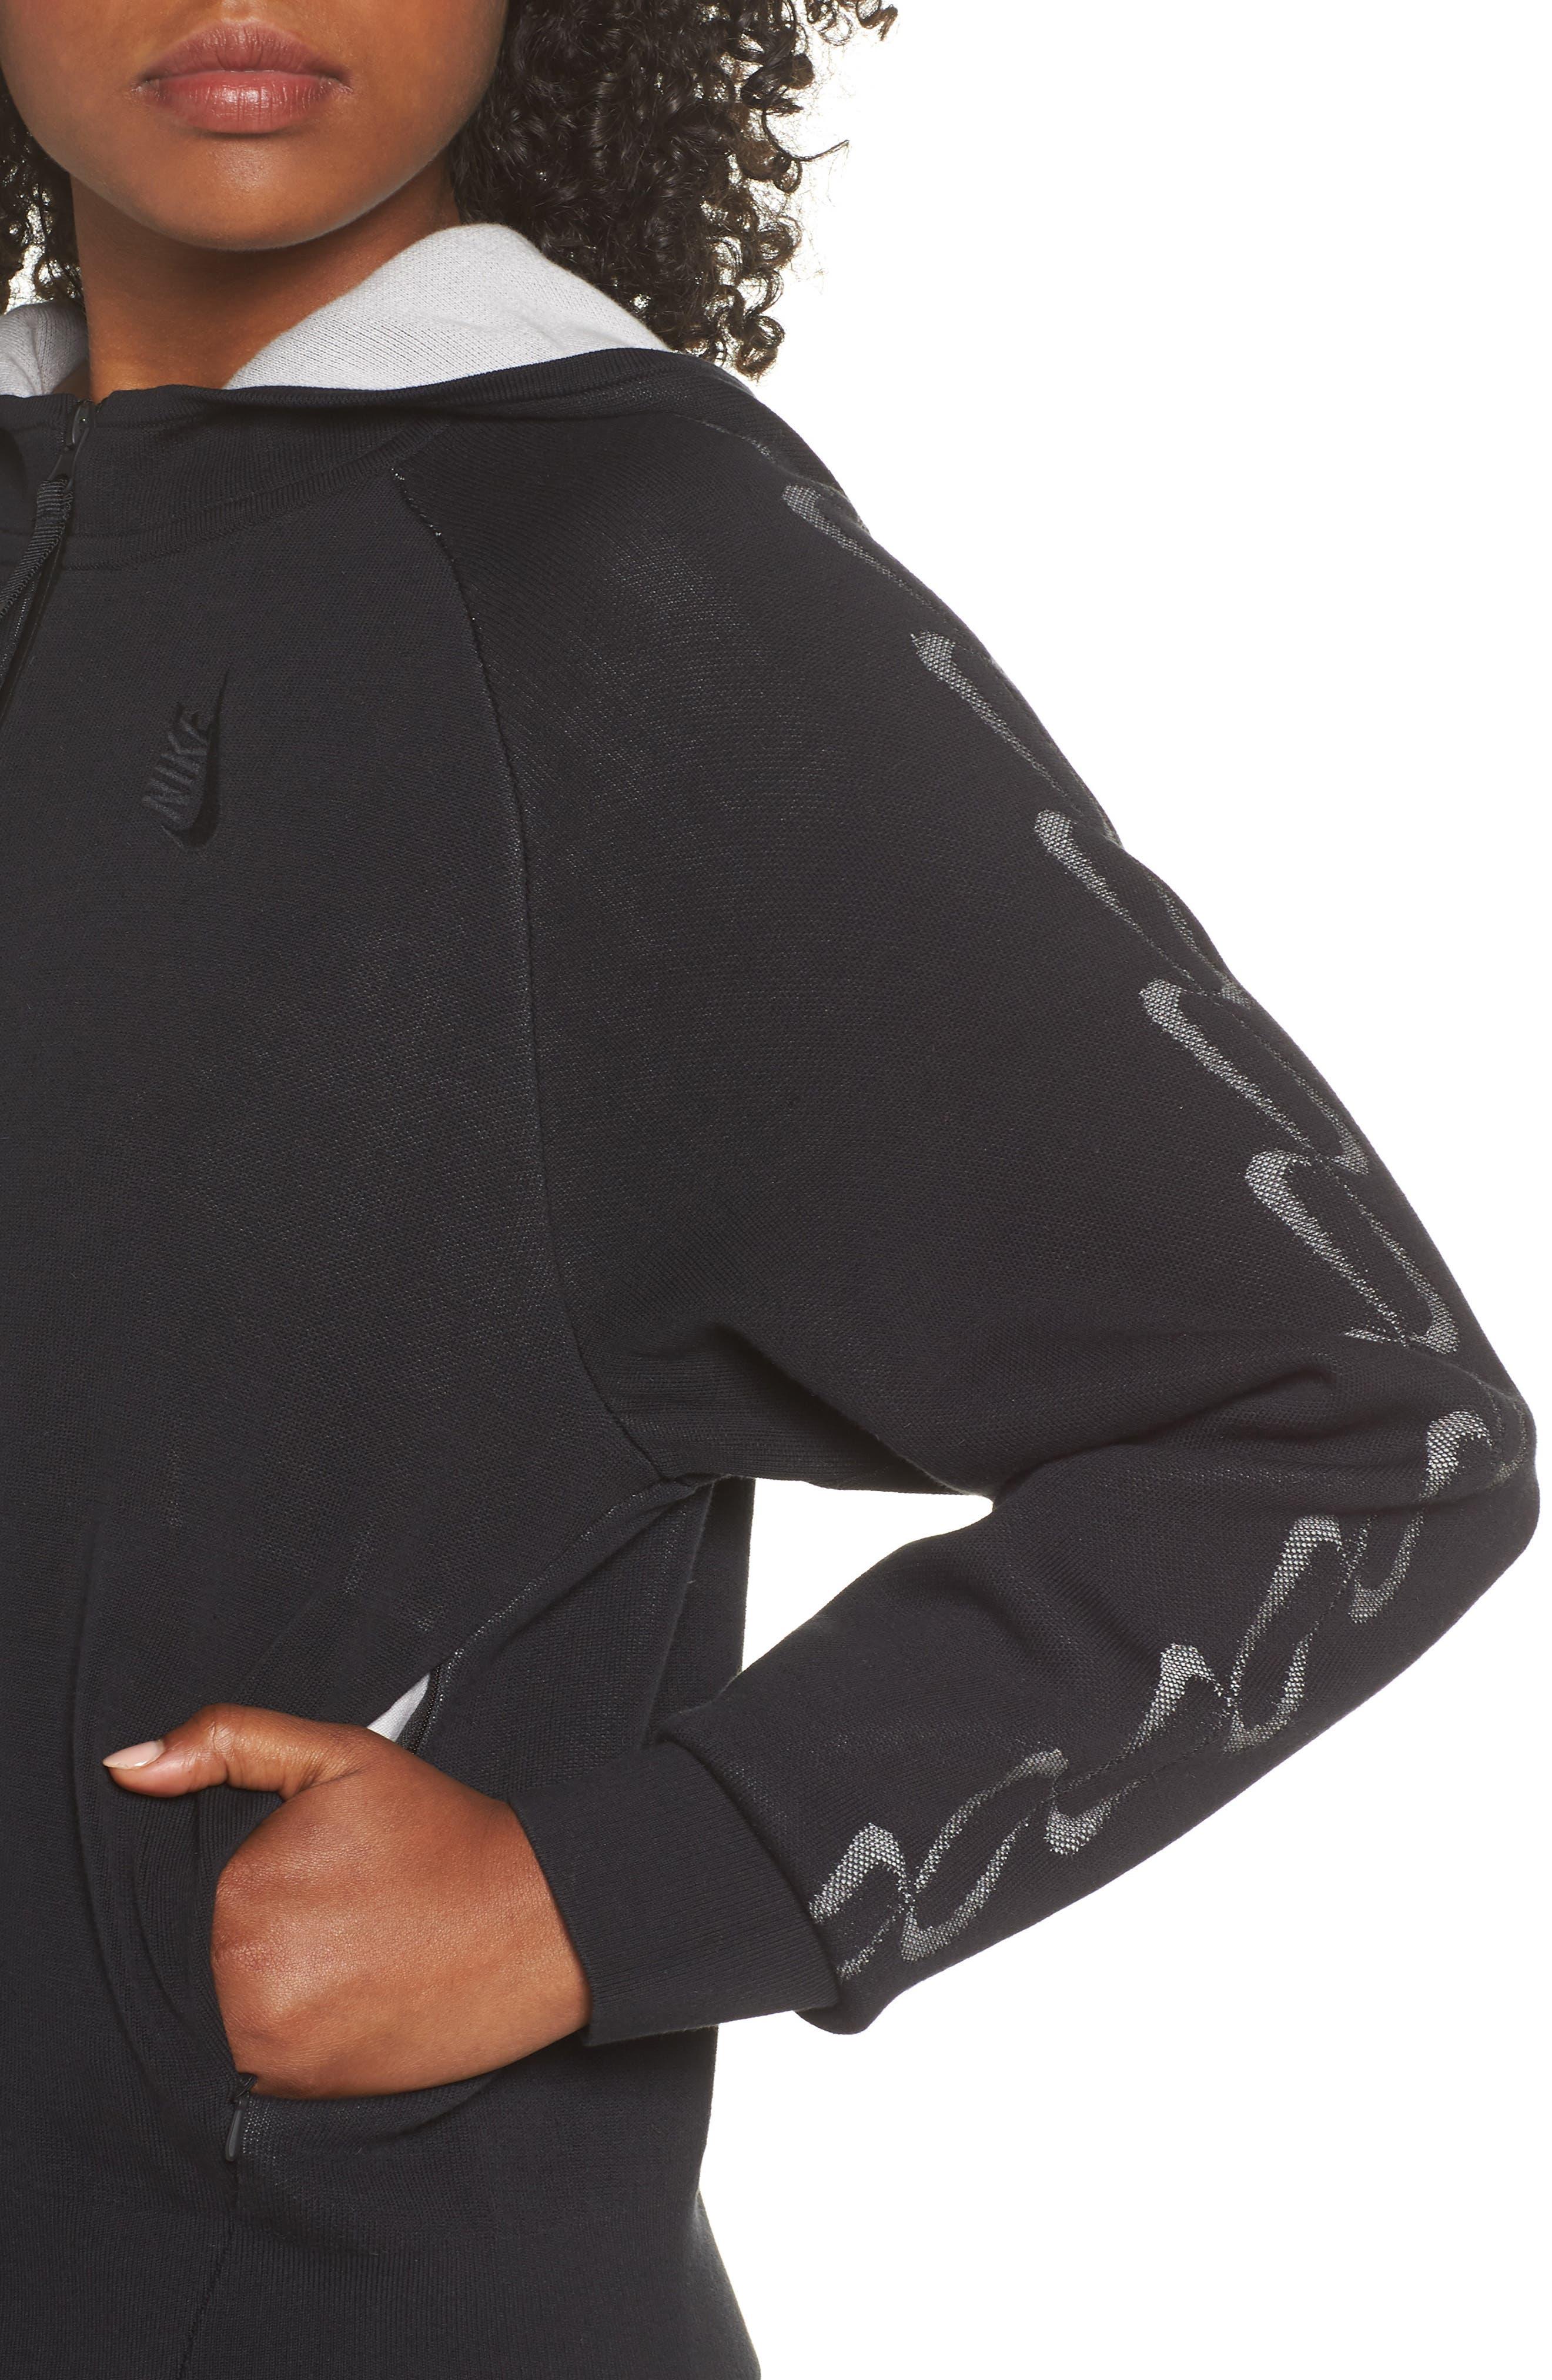 NRG Women's Knit Jacket,                             Alternate thumbnail 4, color,                             Black/ Vast Grey